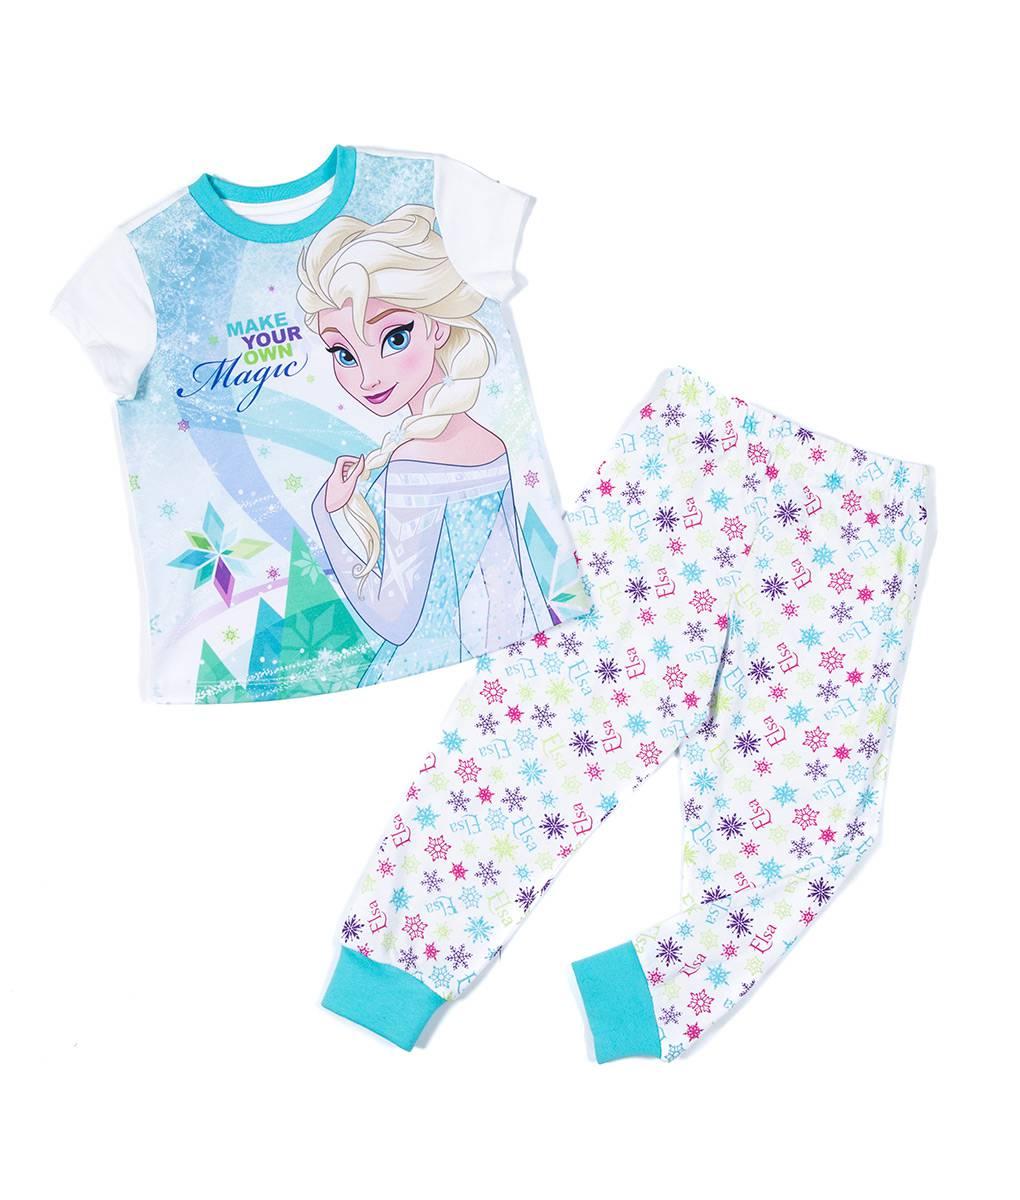 Pijama niña Frozen               Tallas: 2, 4, 6, 10          Precio: $19,00